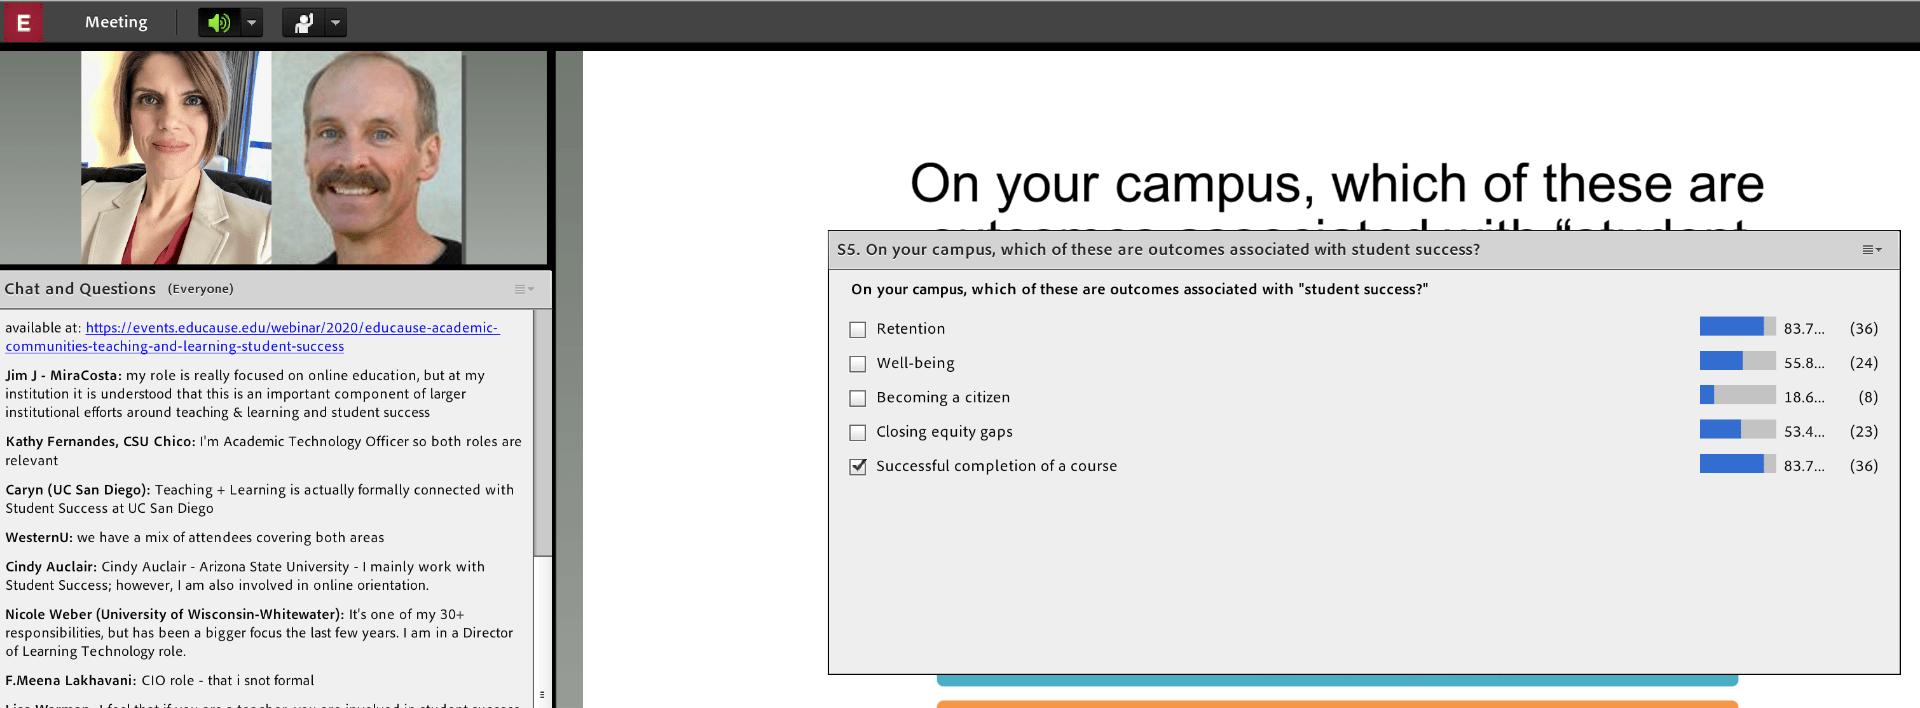 campus outcomes